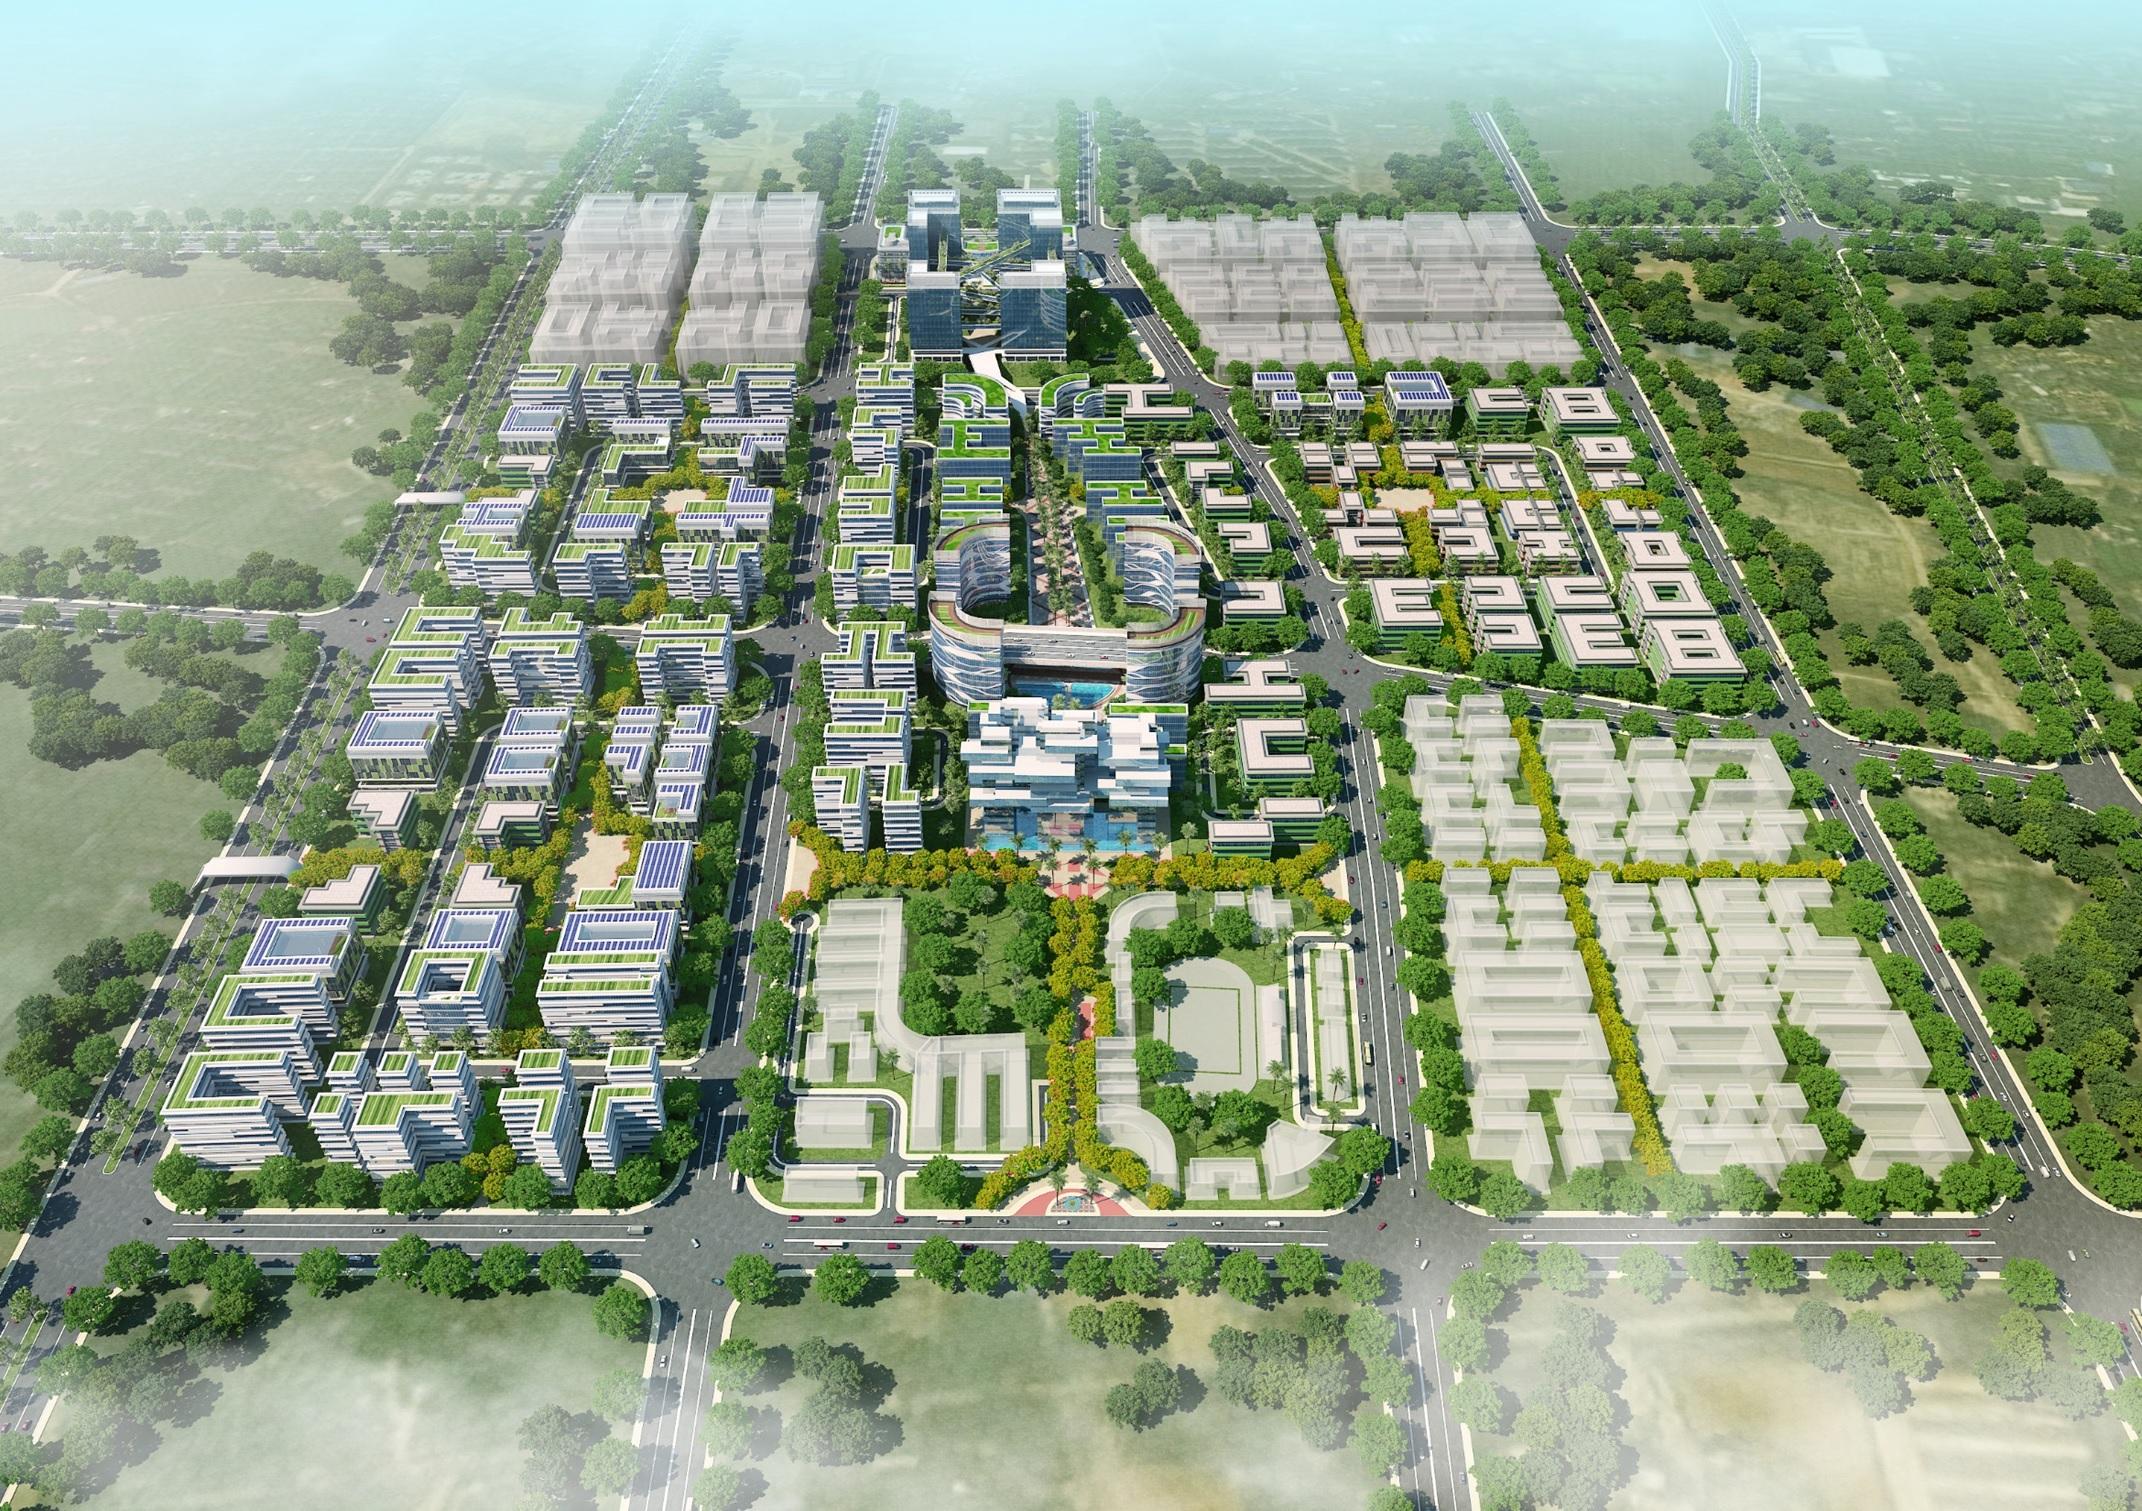 Longping Modern Industrial Park